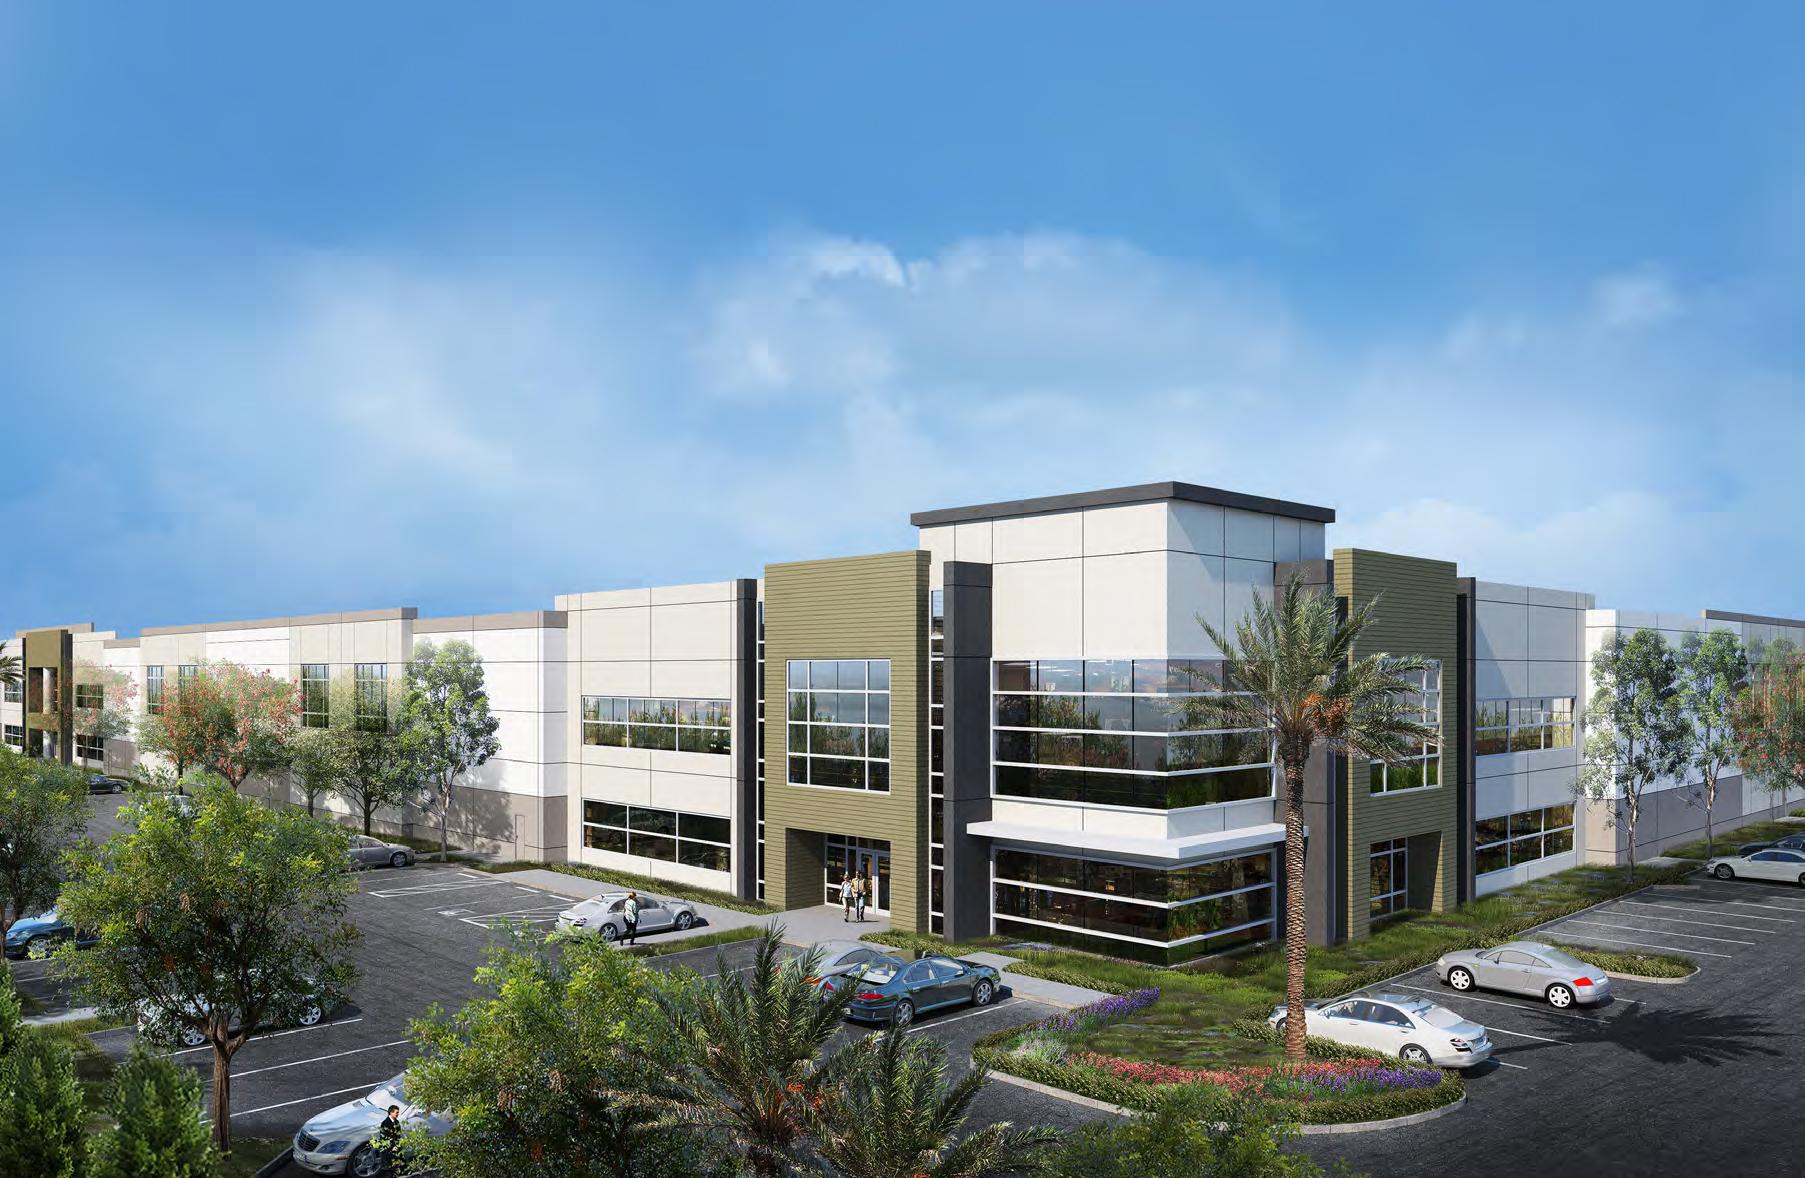 Major Tenant Deal Inked for Huntington Gateway